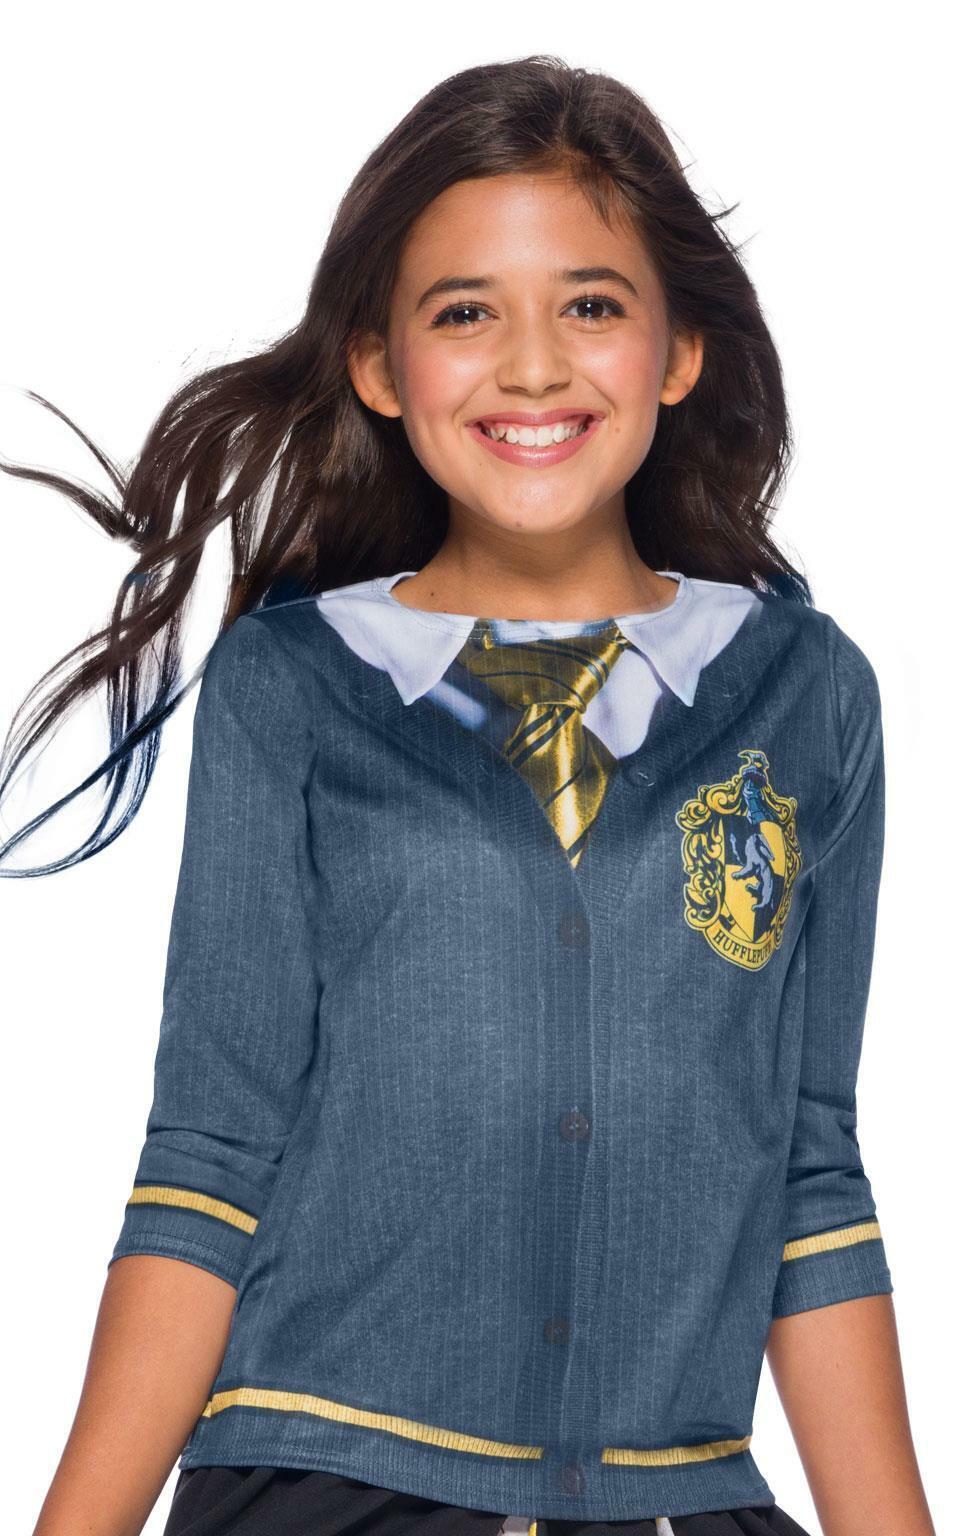 Child Harry Potter Hufflepuff Girls Costume Top